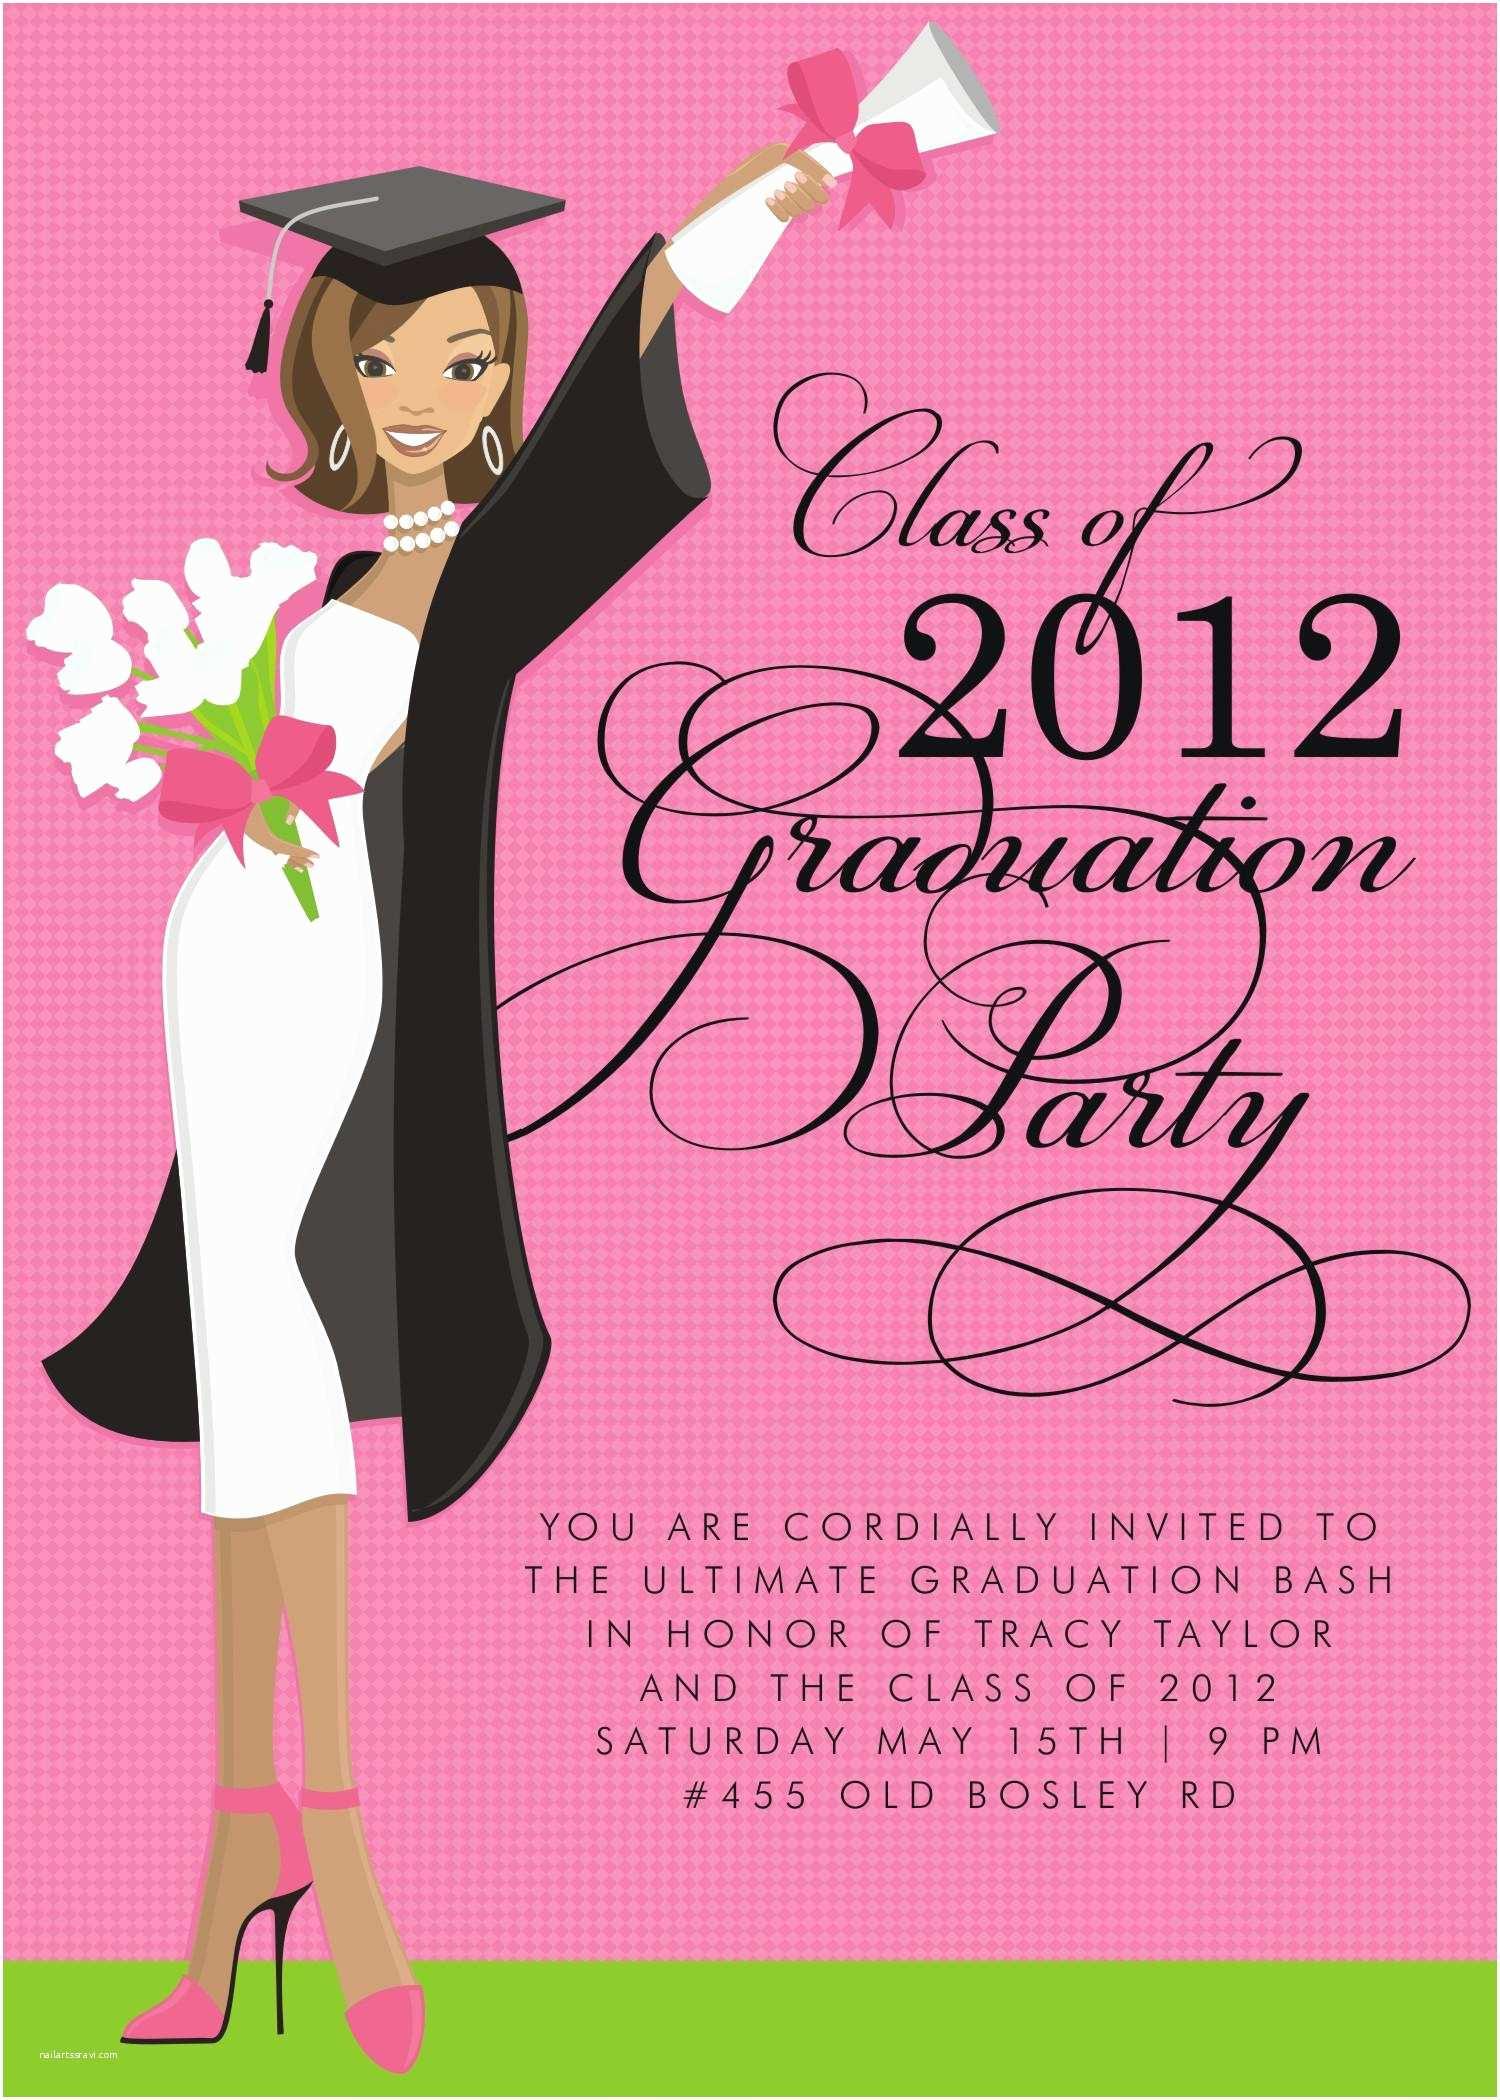 Graduation Reception Invitations Graduation Invitations Graduation Invitations Wording